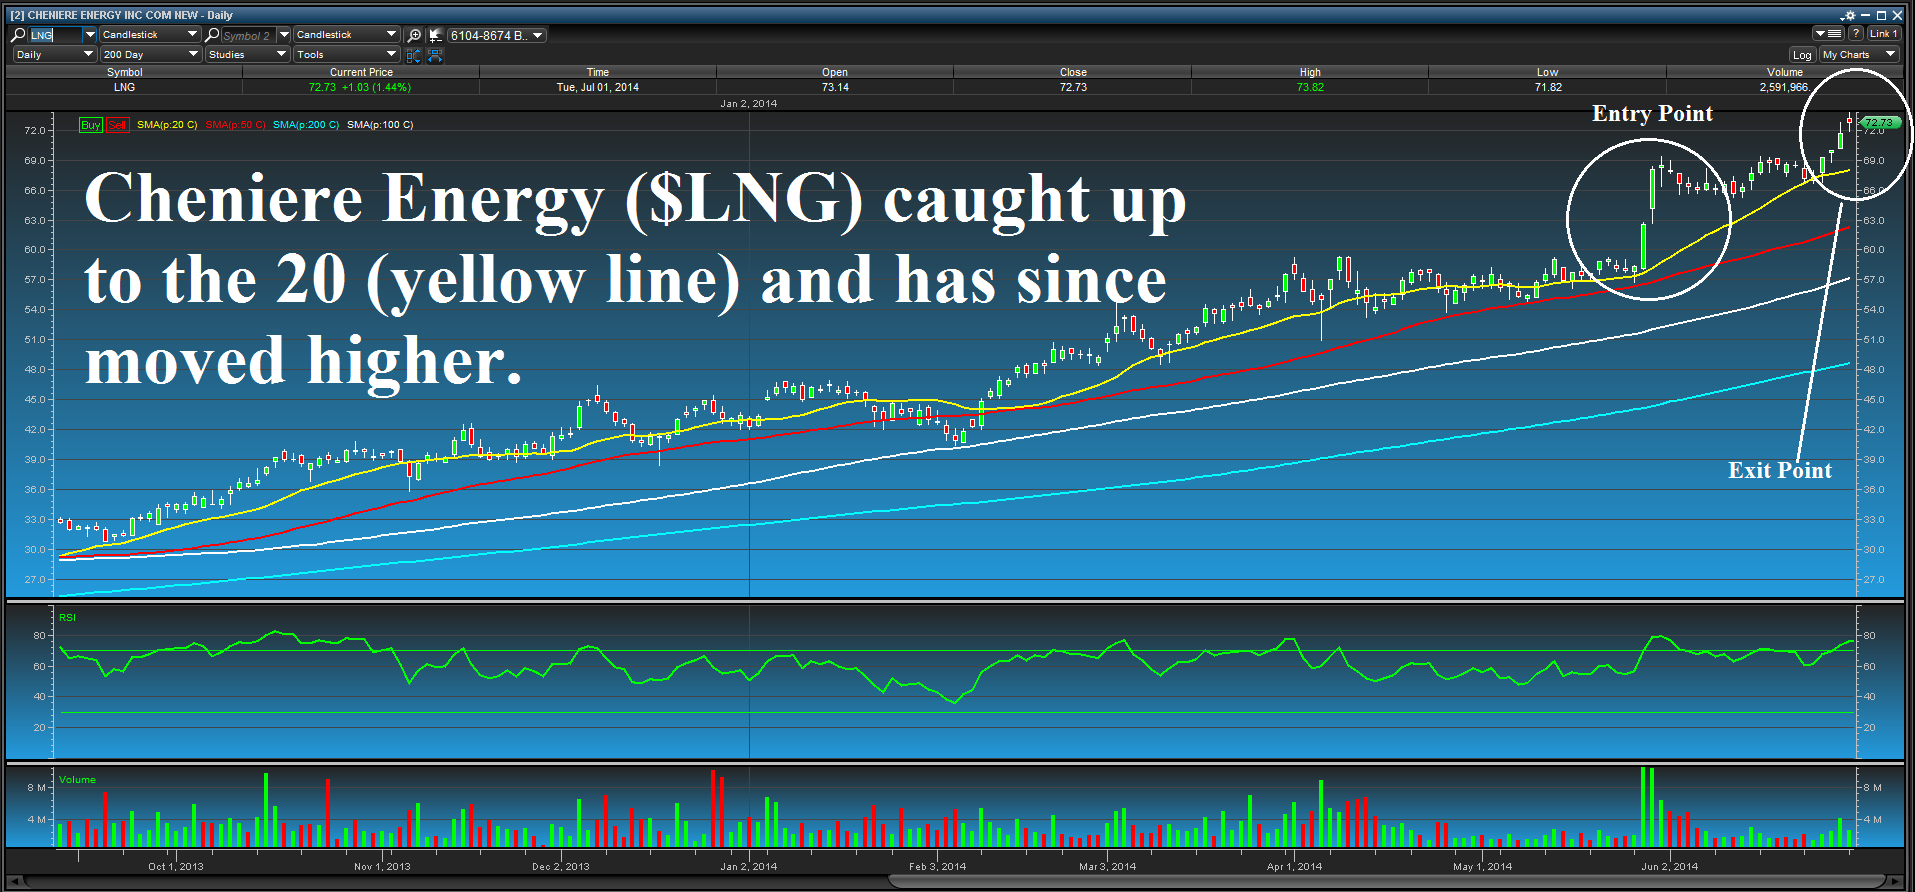 $lng chart